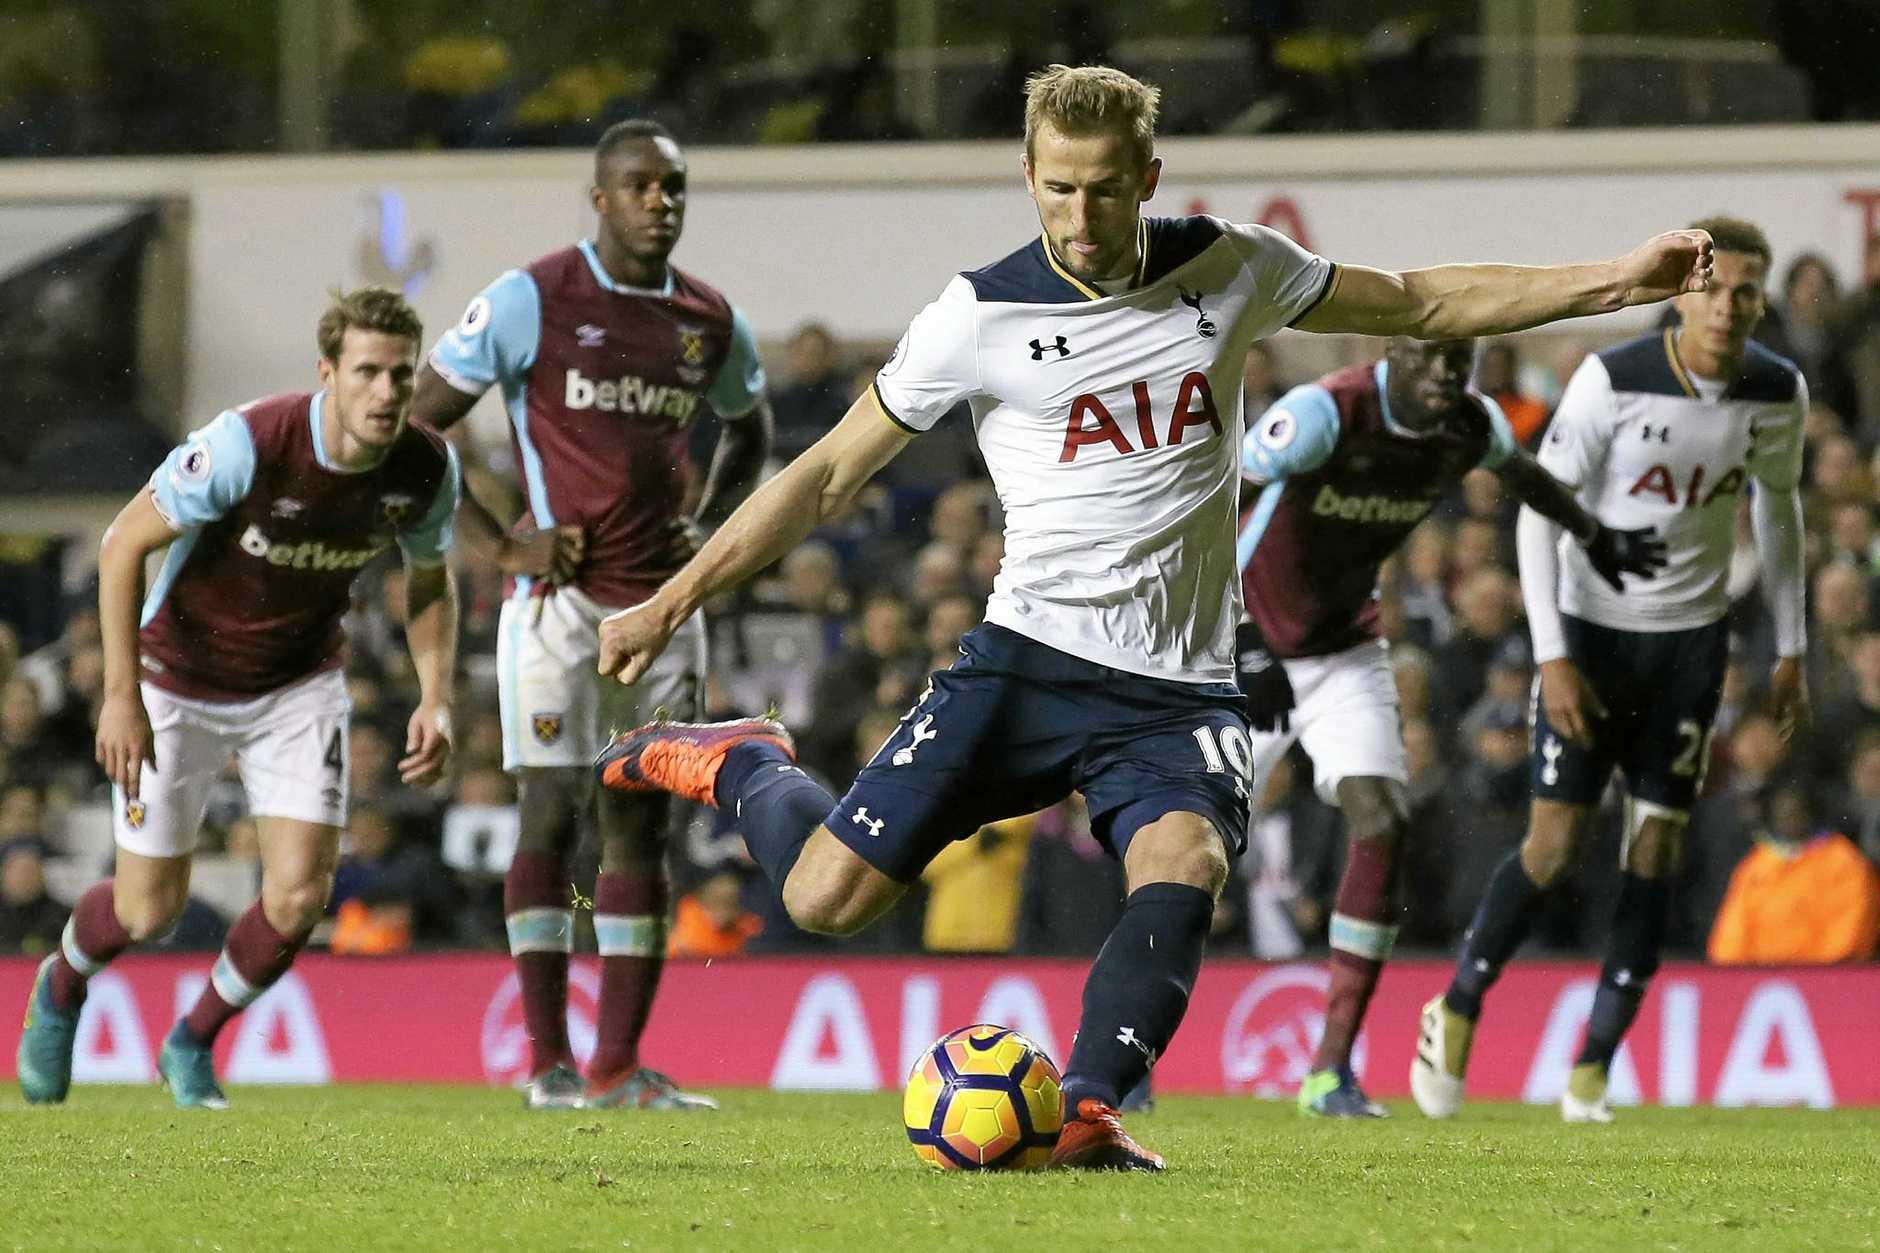 Tottenham's Harry Kane scores a penalty during the English Premier League match against West Ham.